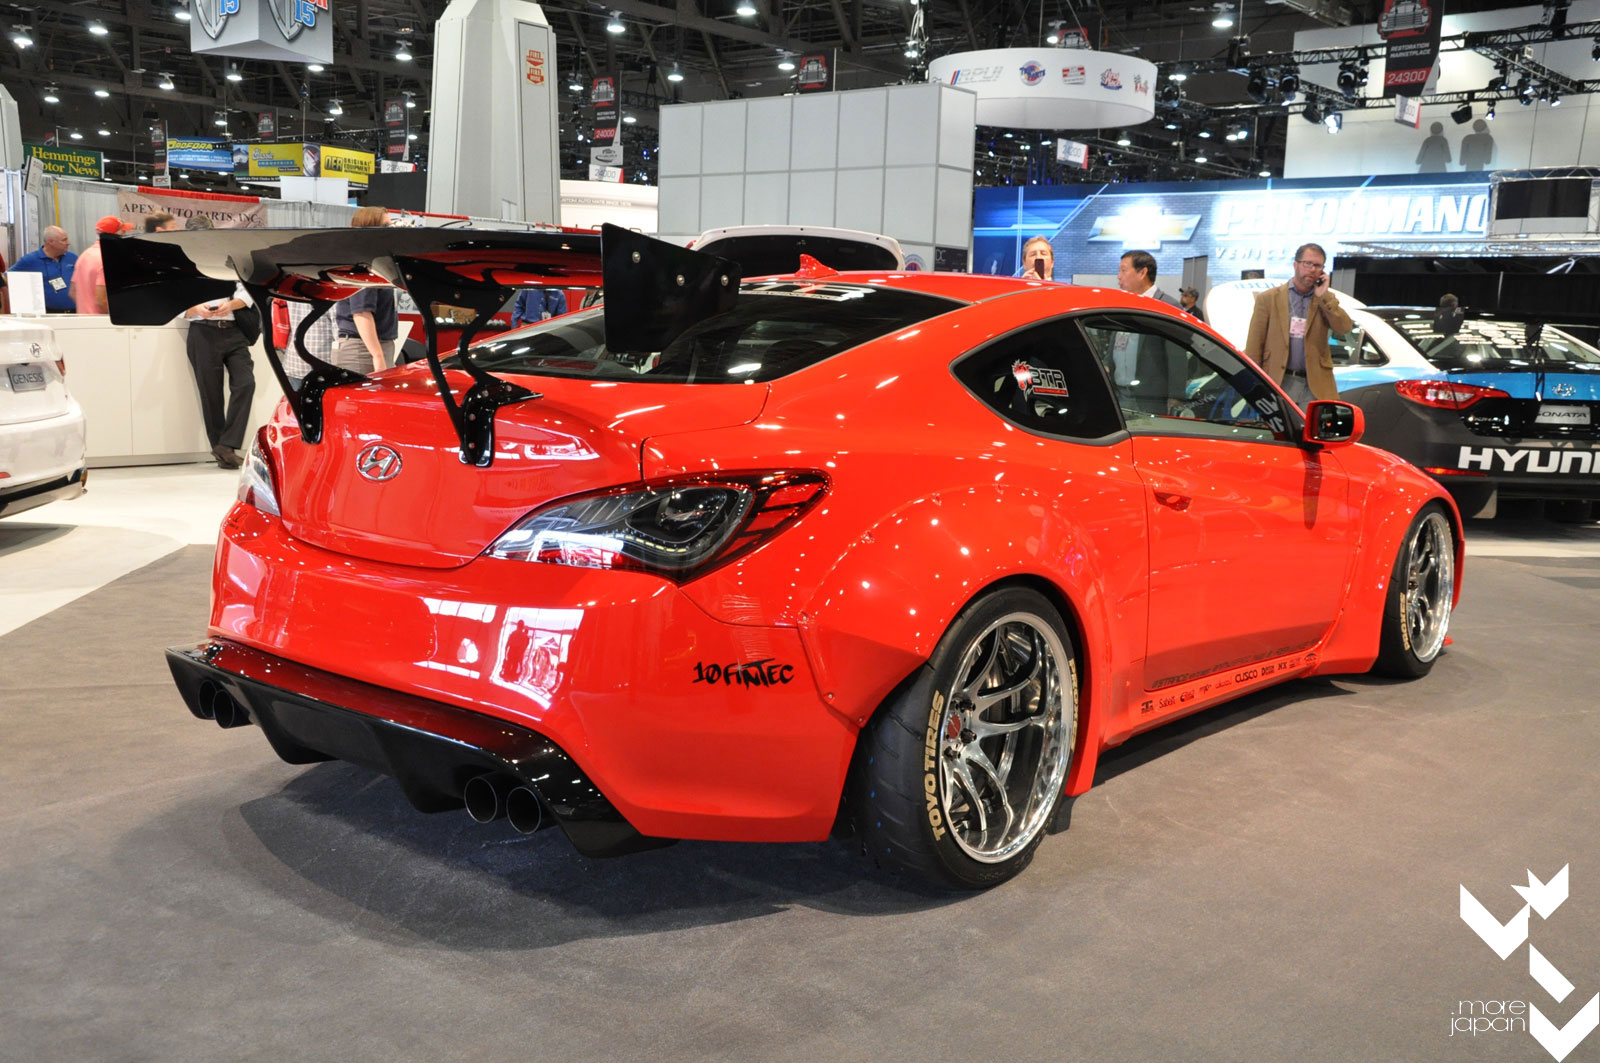 2014 Sema Spotlight Blood Type Racing S Rocket Bunny Genesis Coupe 187 More Japan Blog